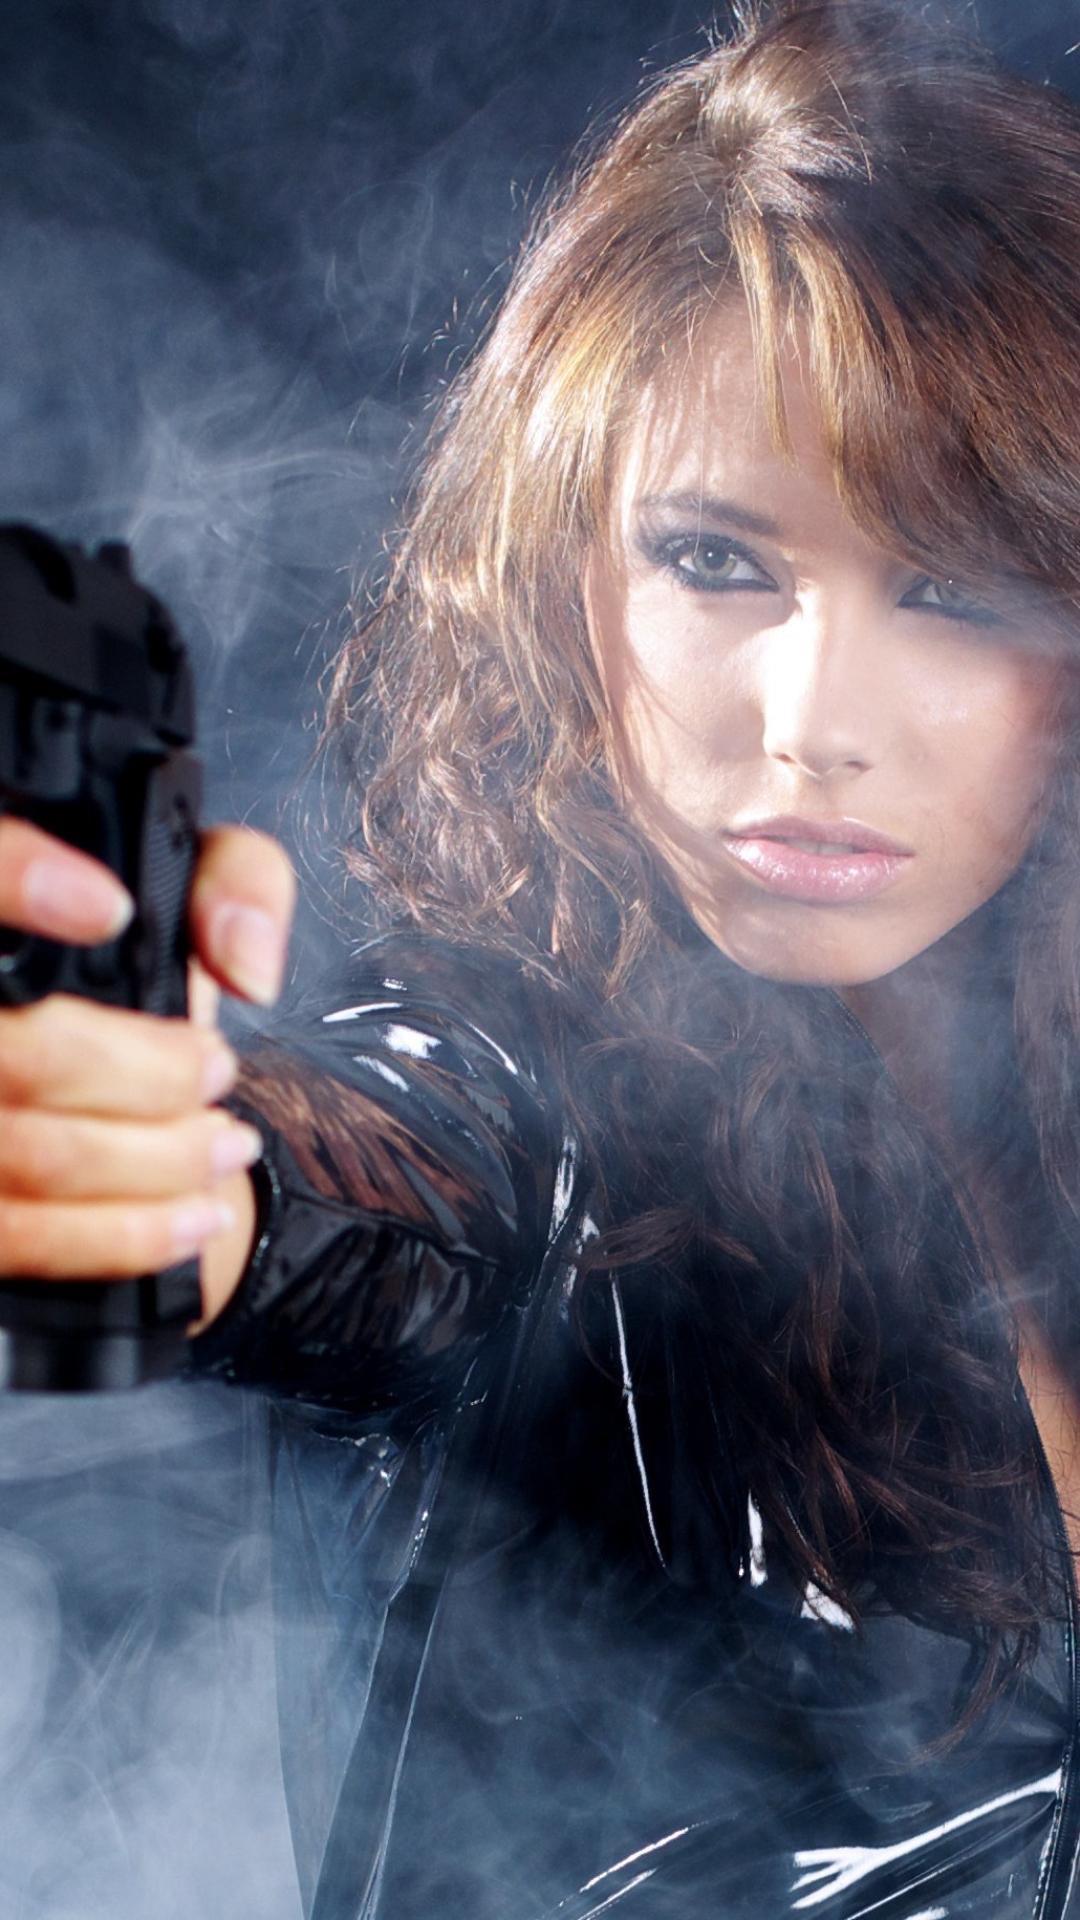 Womengirls guns 1080x1920 wallpaper id 633763 mobile abyss women girls guns 1080x1920 mobile wallpaper voltagebd Choice Image